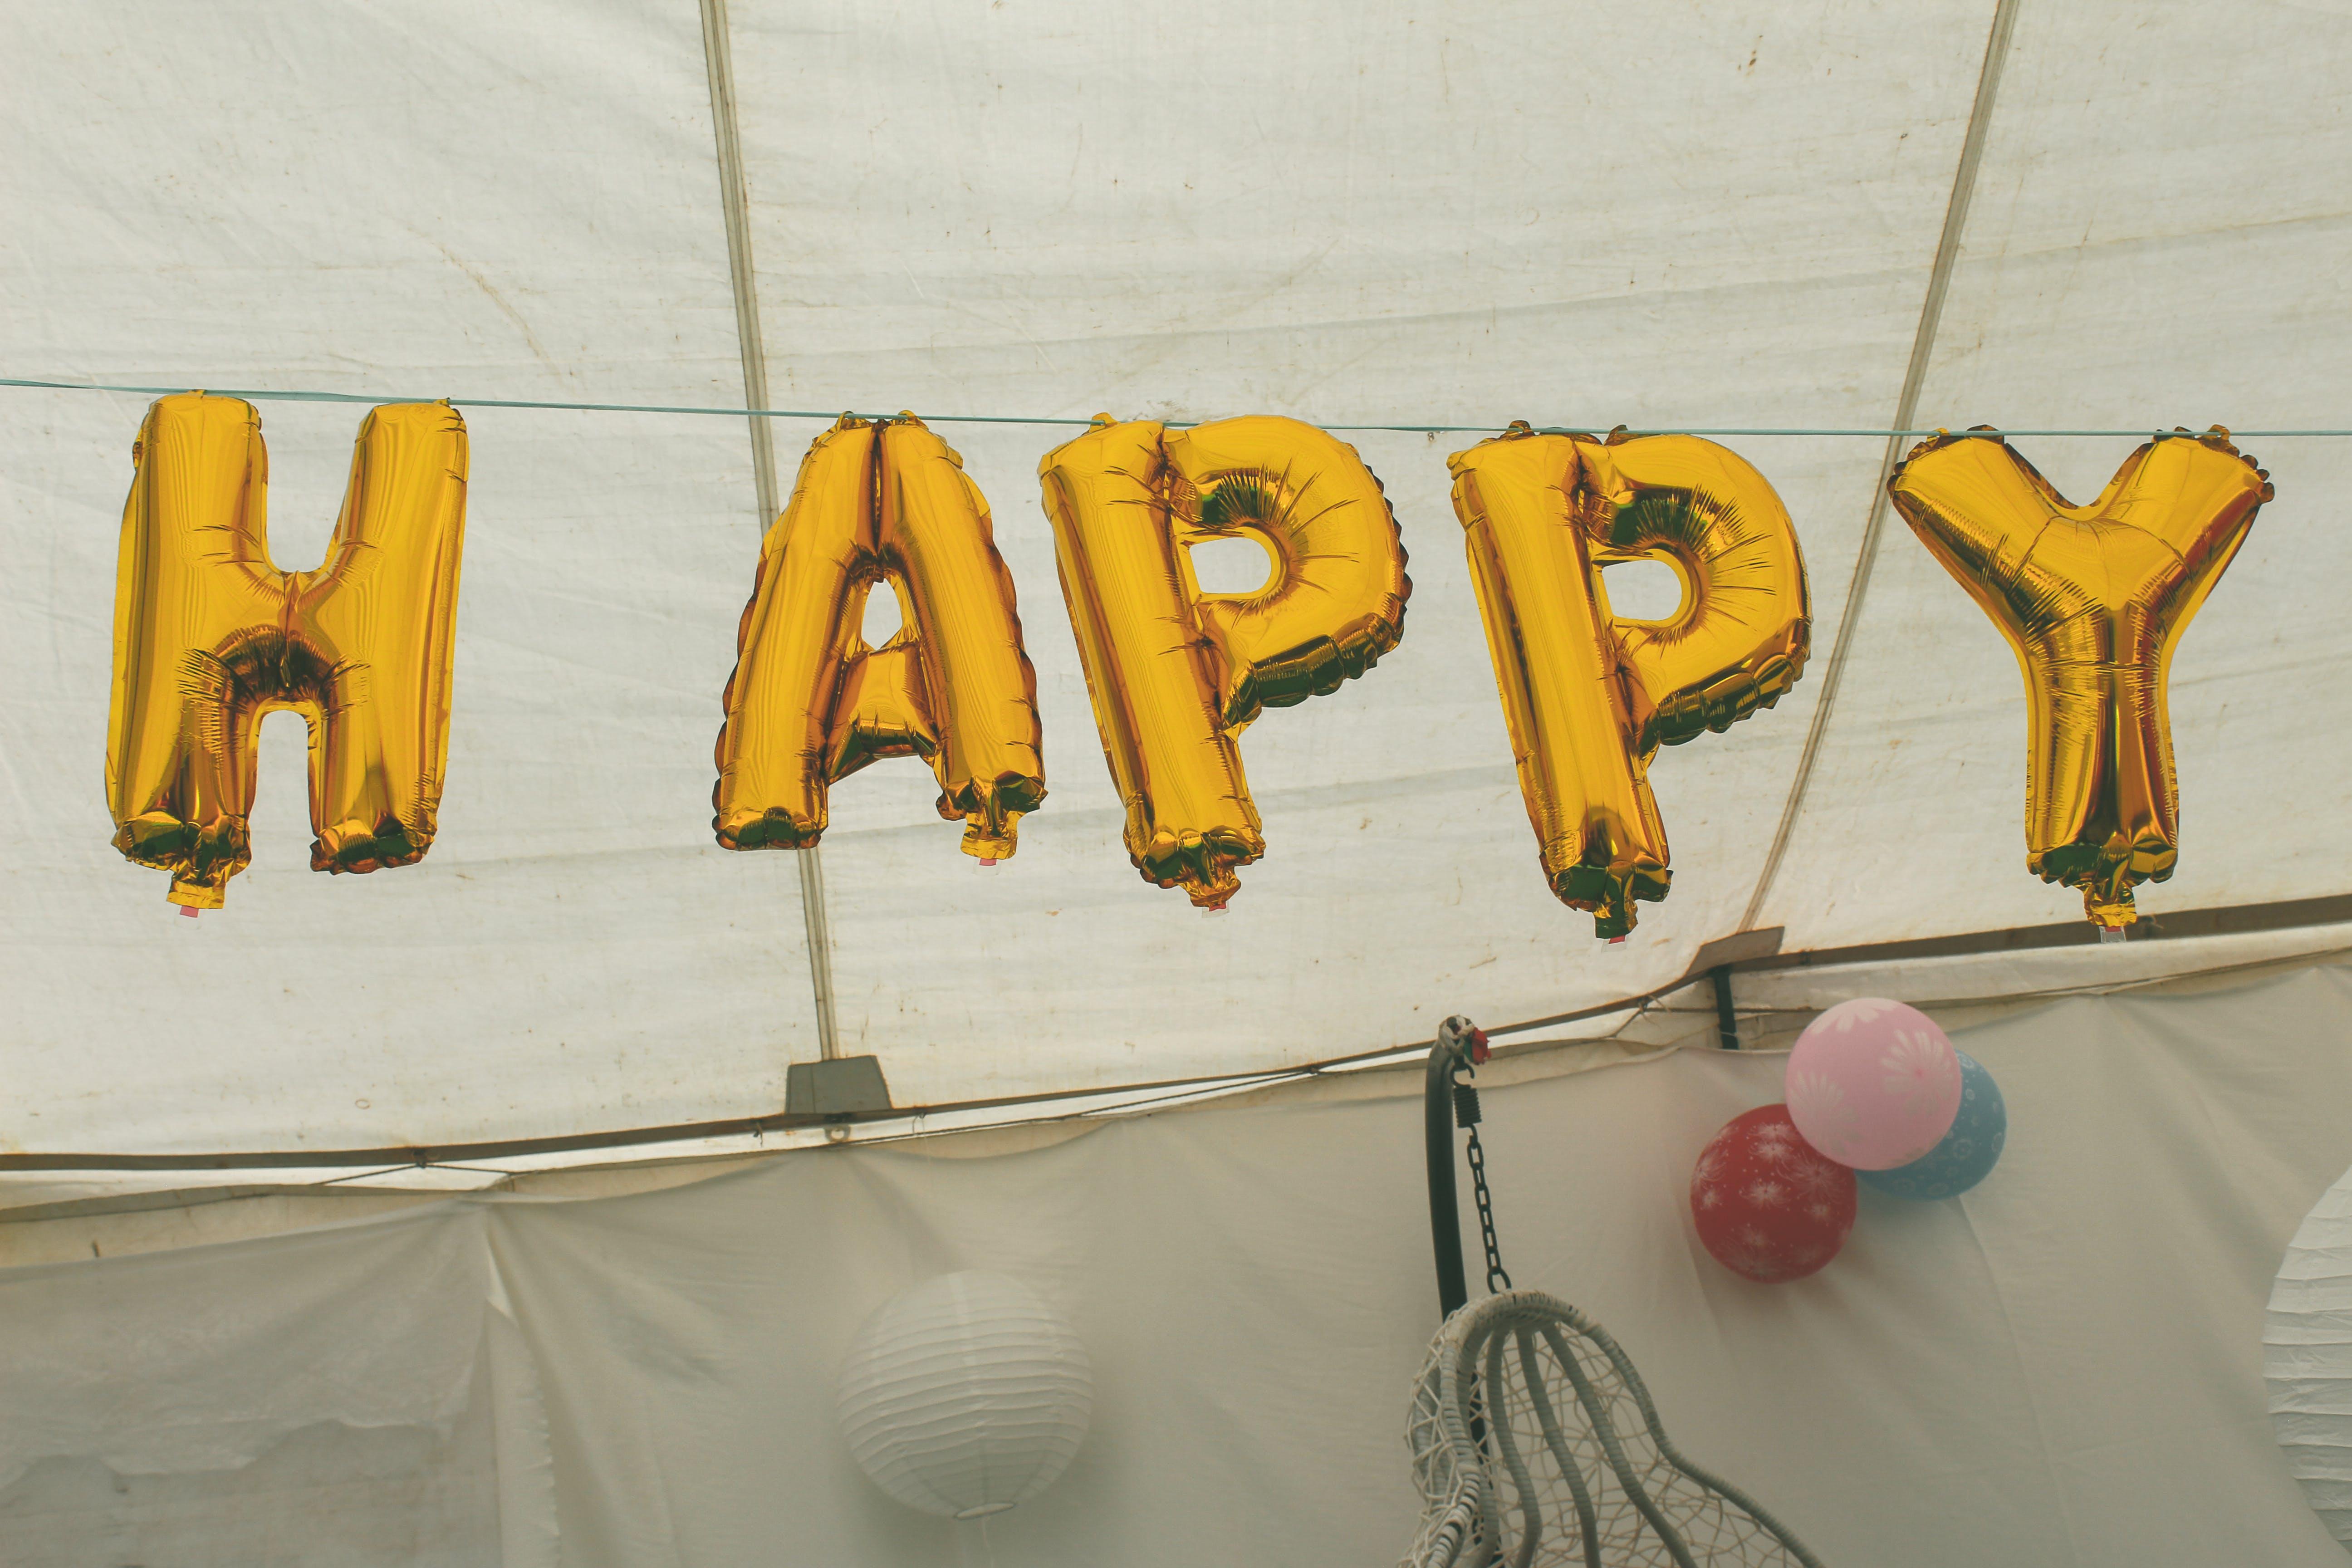 Kostenloses Stock Foto zu ballons, dekor, dekoration, feier